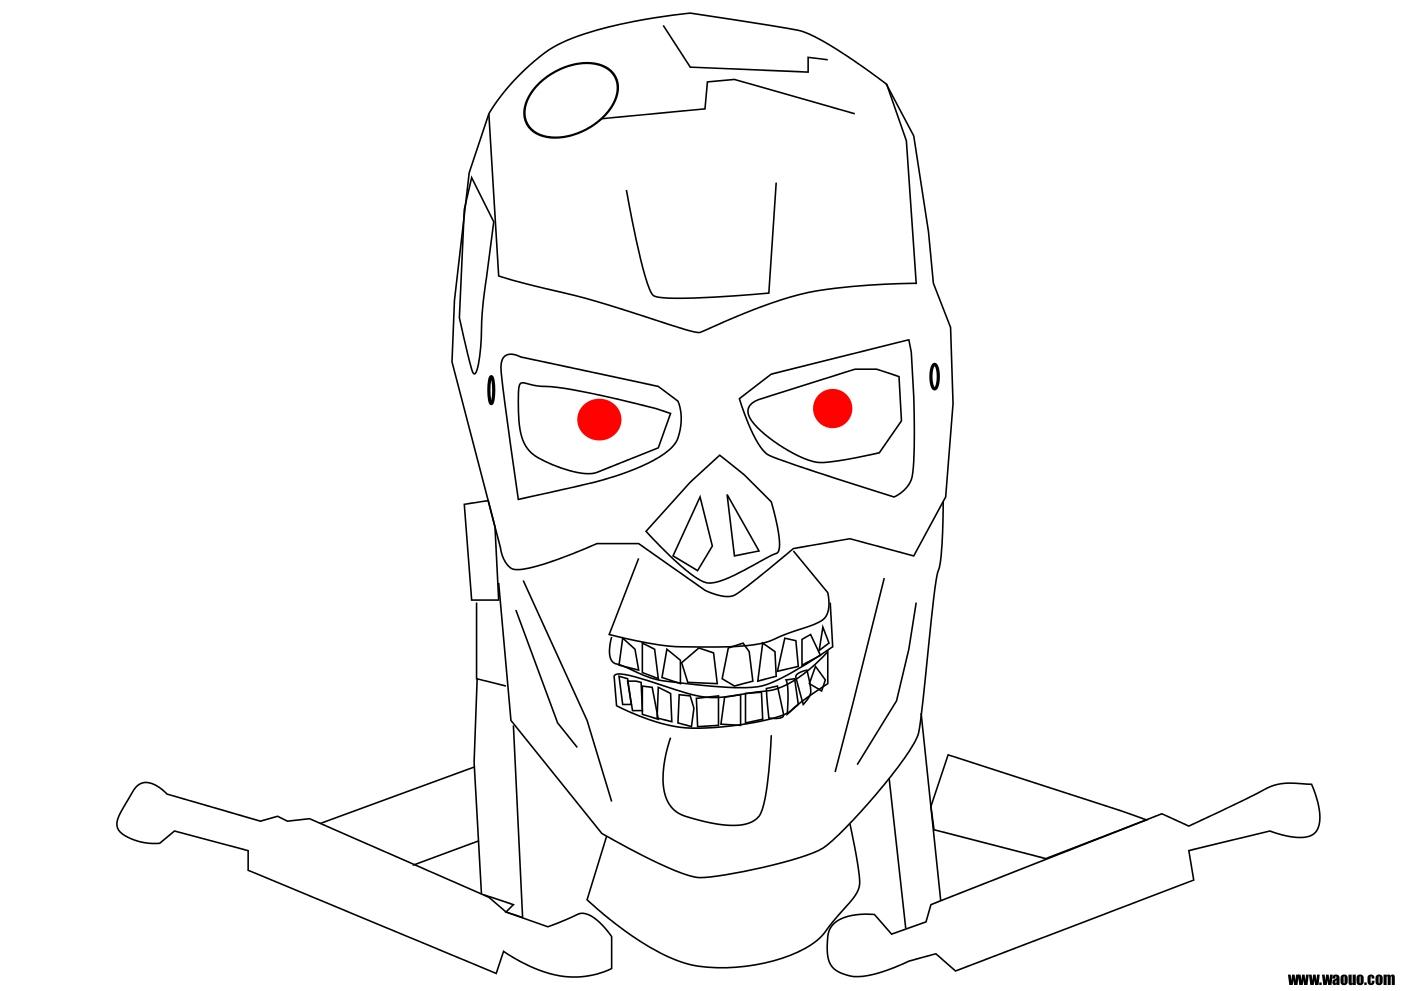 Coloriage Terminator Robot Du Futur À Imprimer Et Colorier intérieur Coloriage Robot À Imprimer